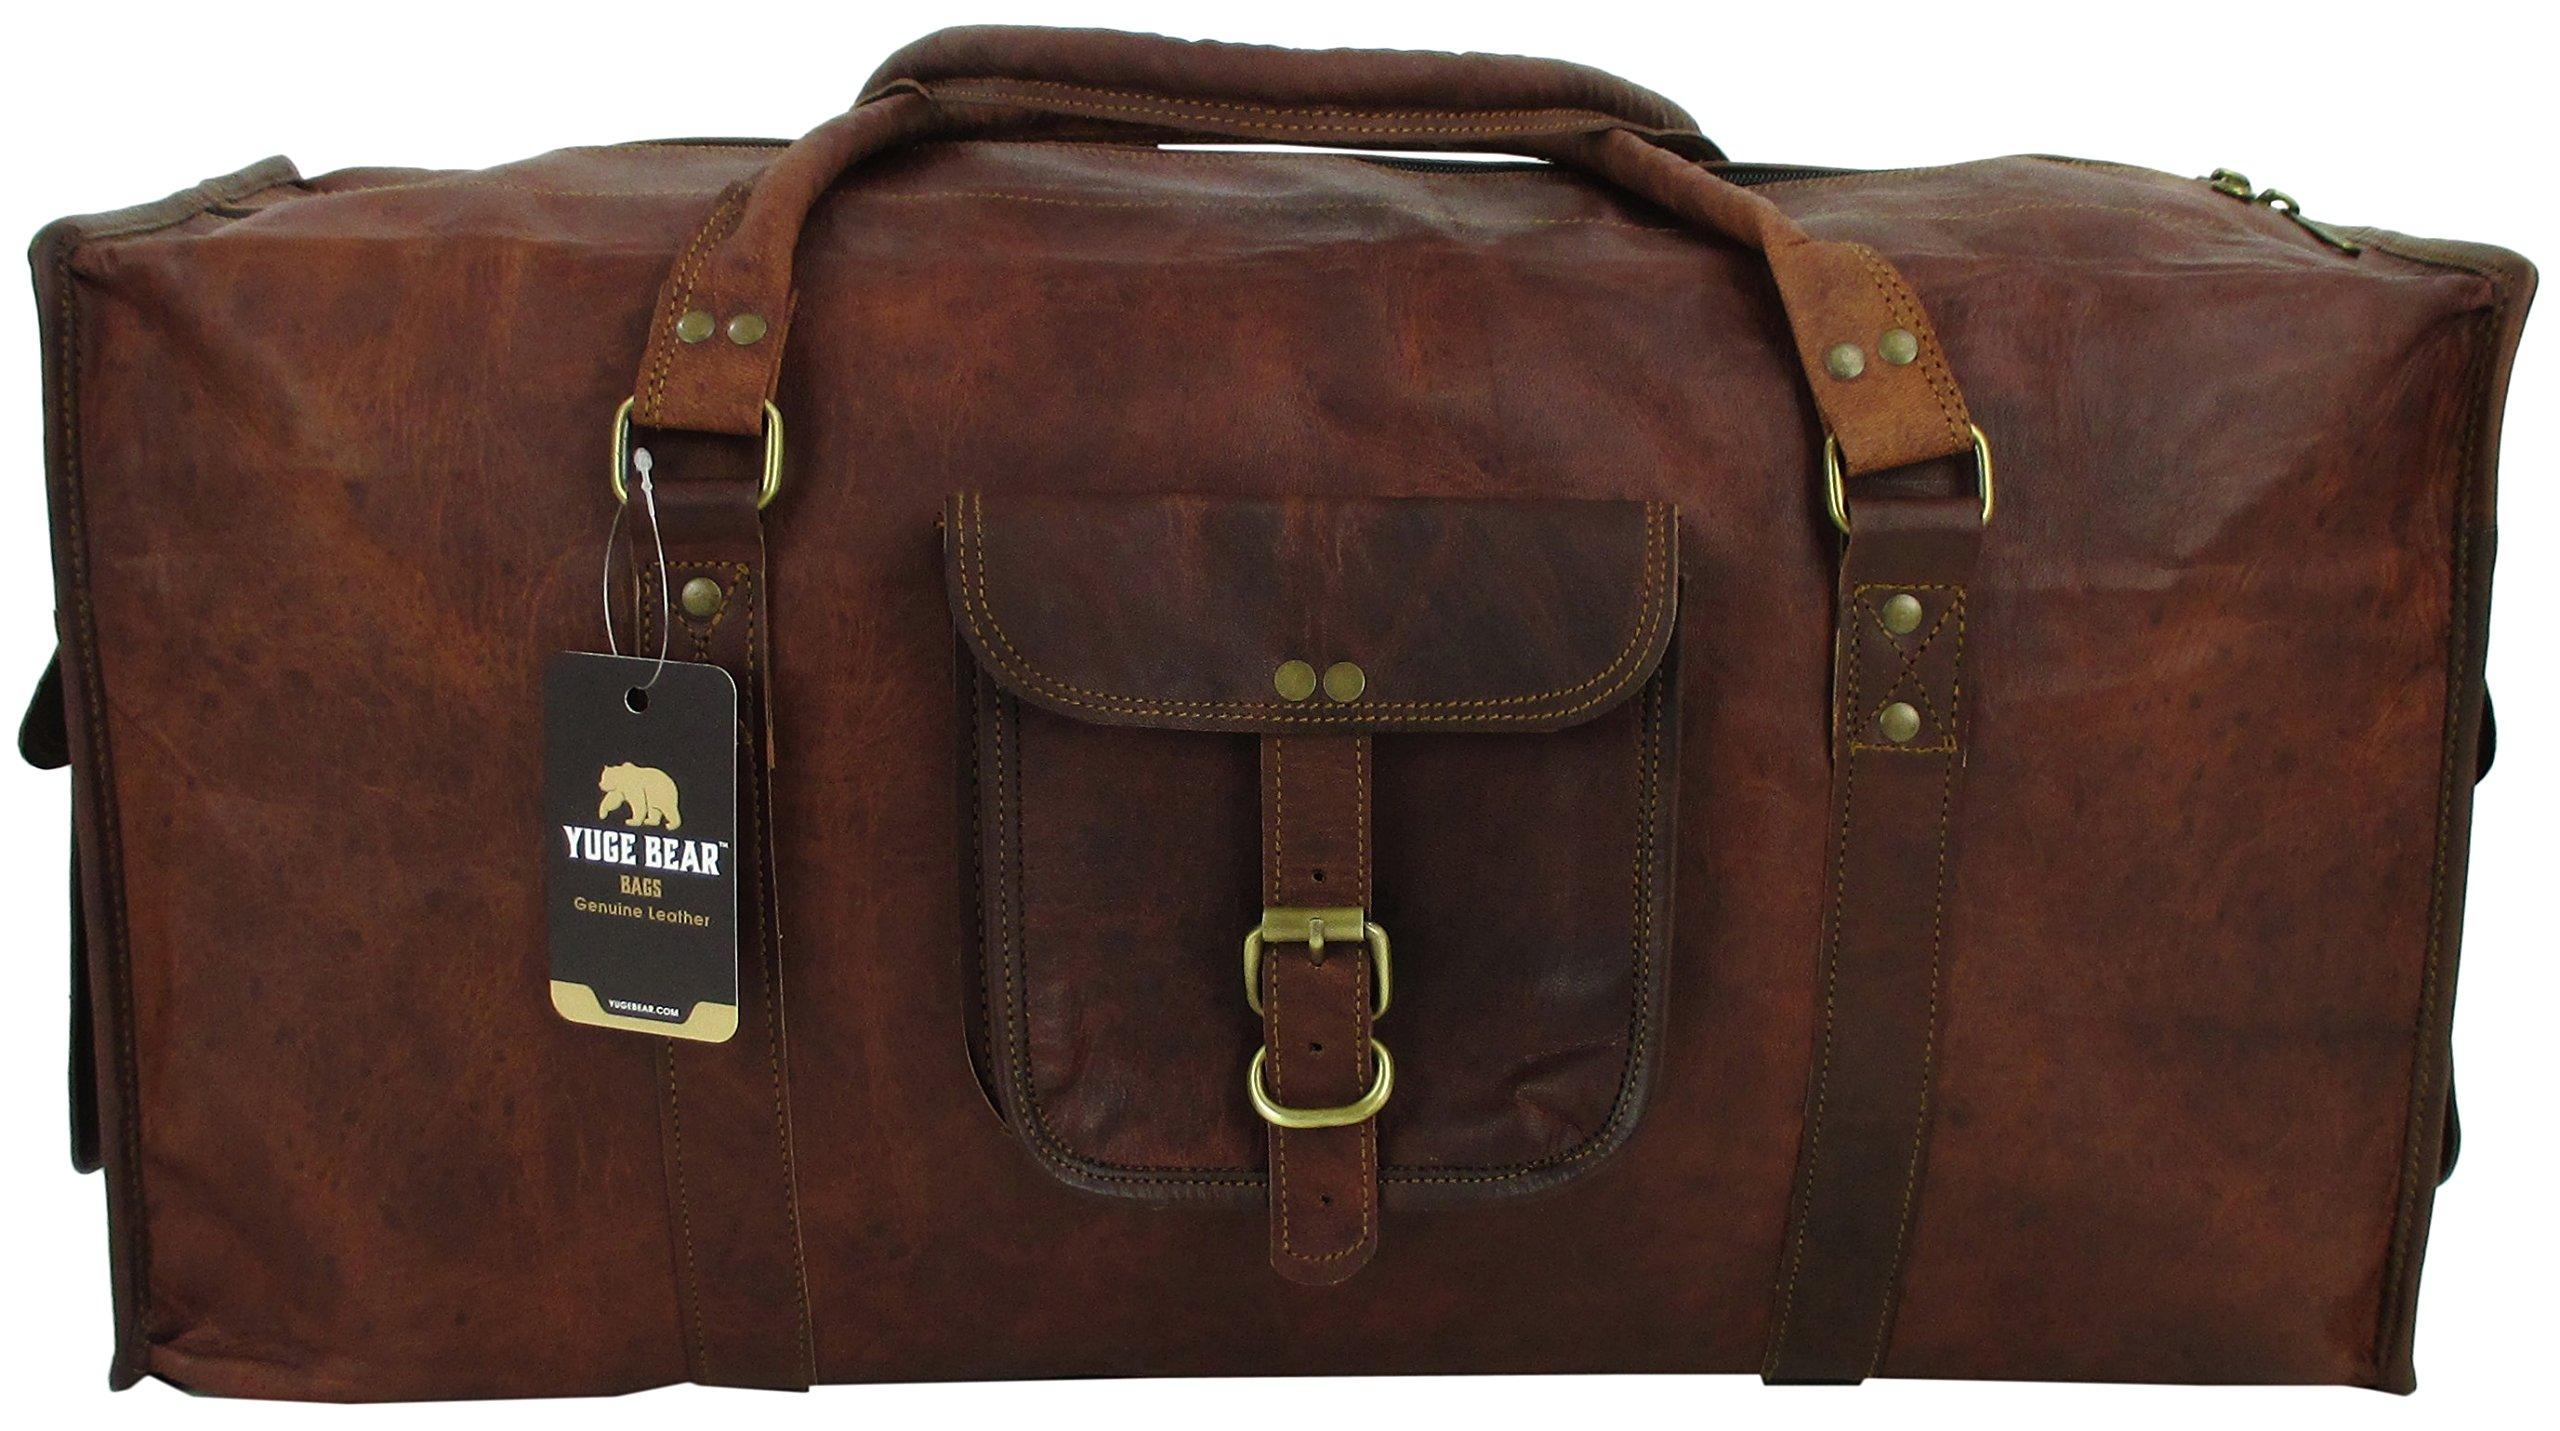 Yuge Bear 24'' DS1 Vintage Genuine Leather Carry On Weekender Duffel Bag by Yuge Bear